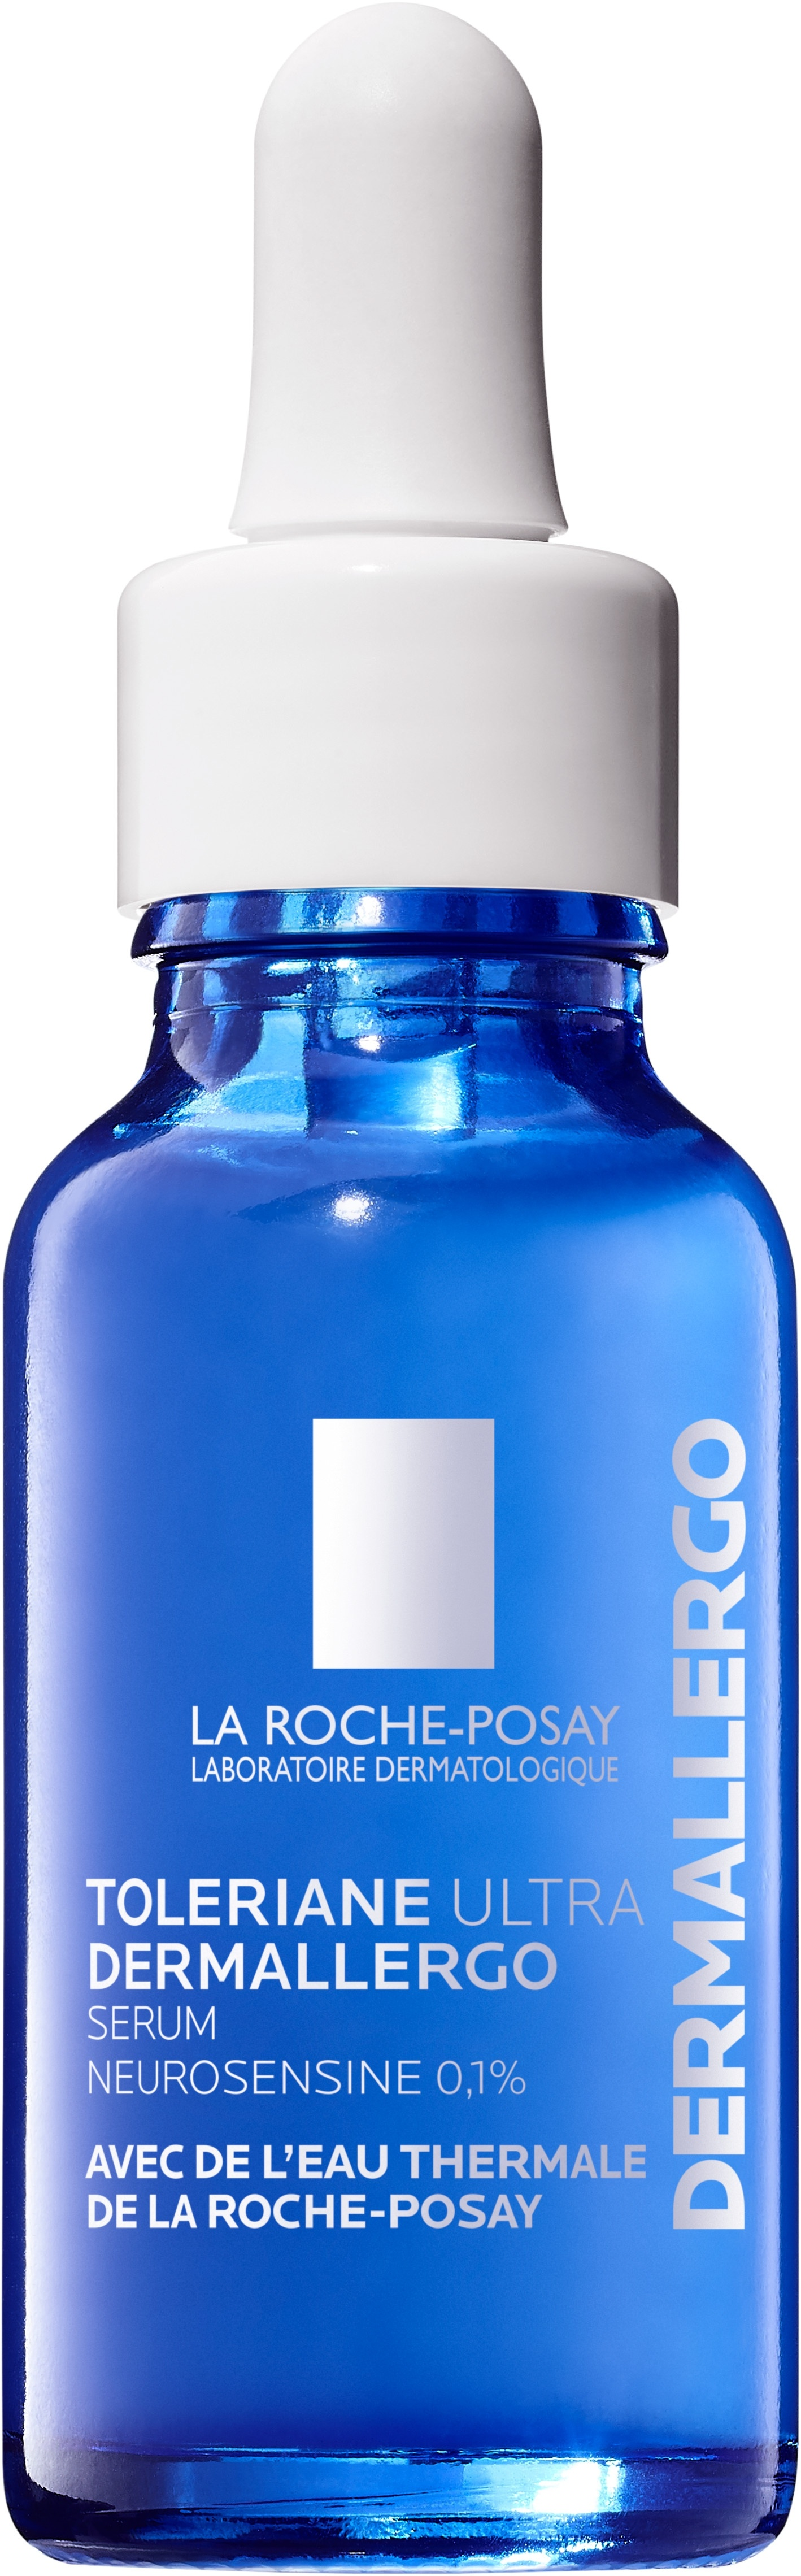 La Roche-Posay Toleriane Ultra Dermallergo Serum 20ml